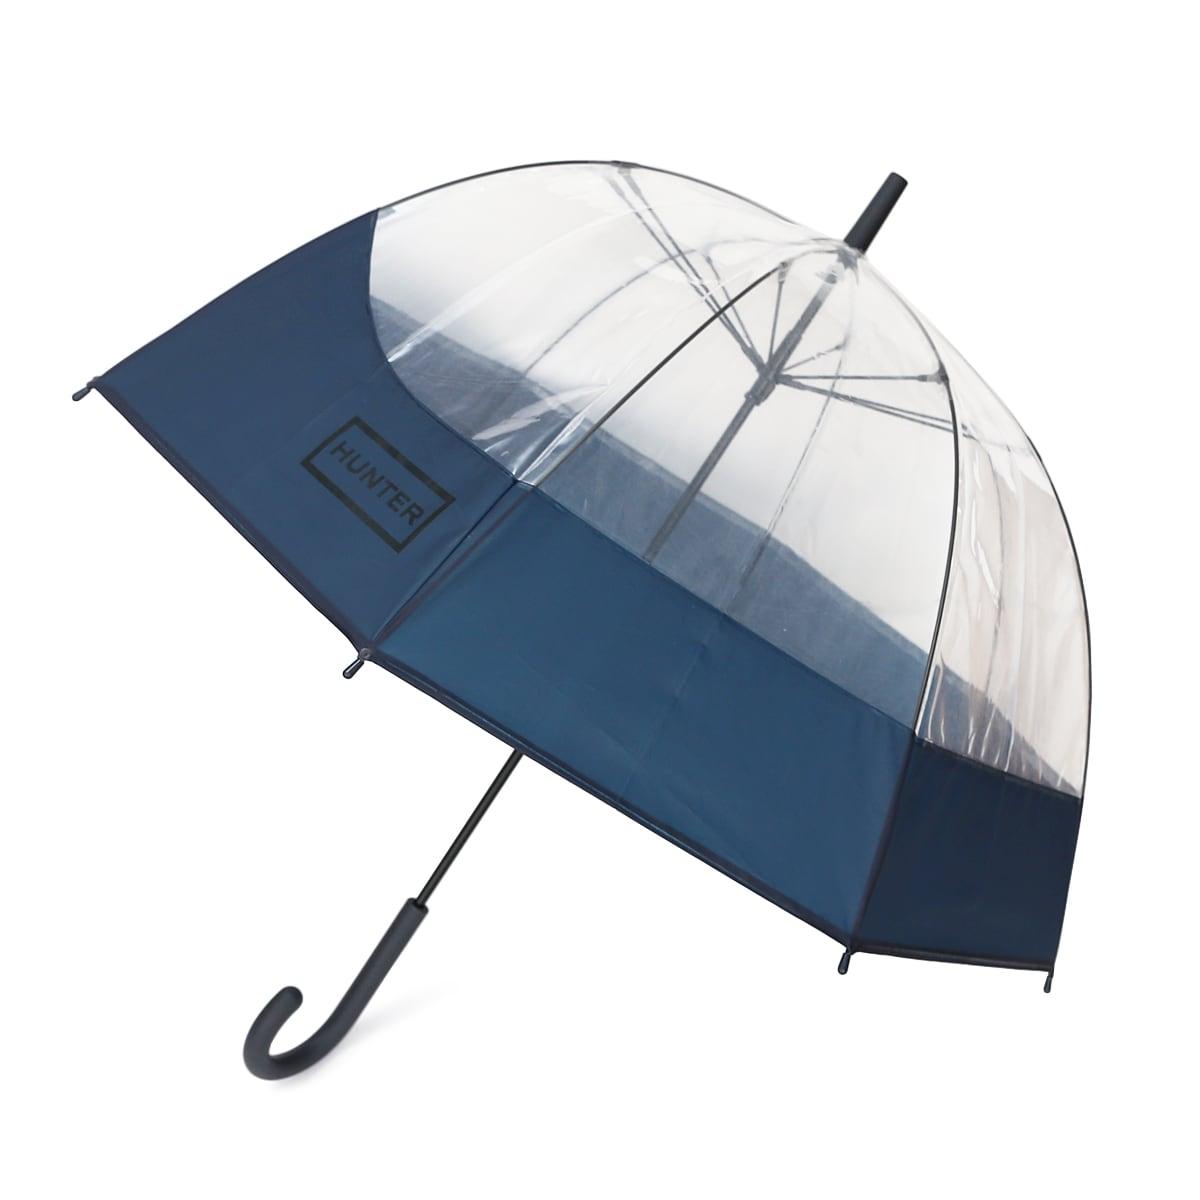 HUNTER(ハンター) アンブレラ 雨傘 開いた(全体像)